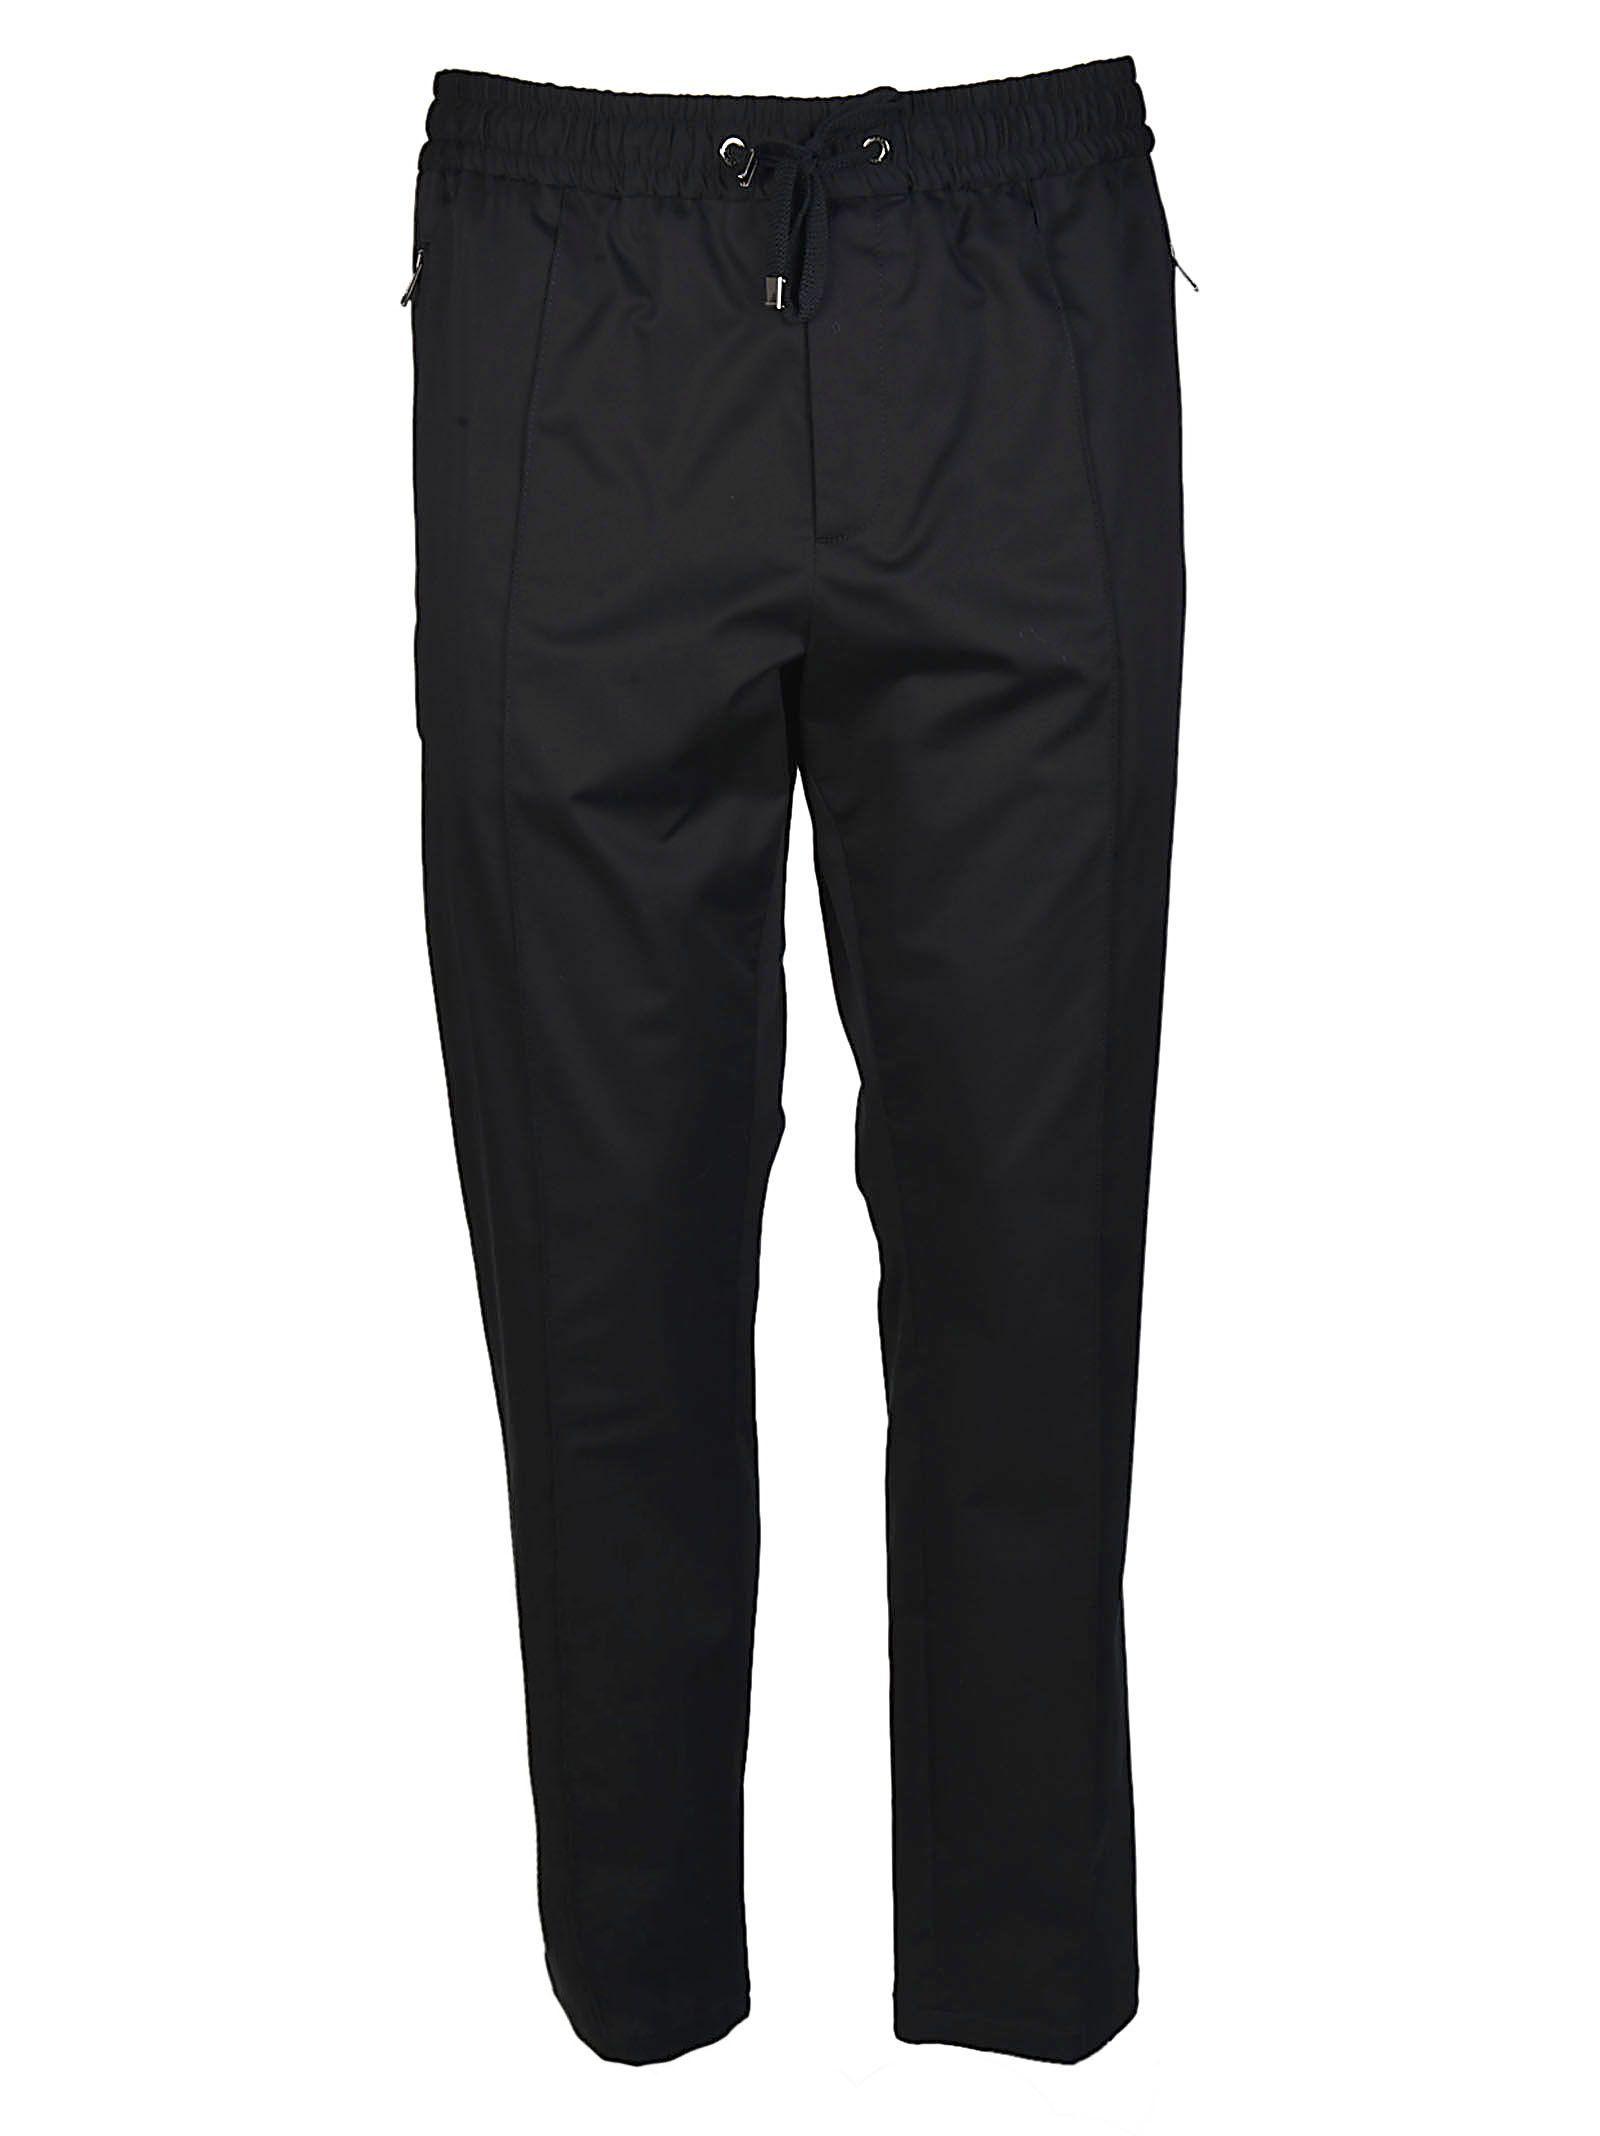 Dolce & Gabbana Straight Leg Track Pants